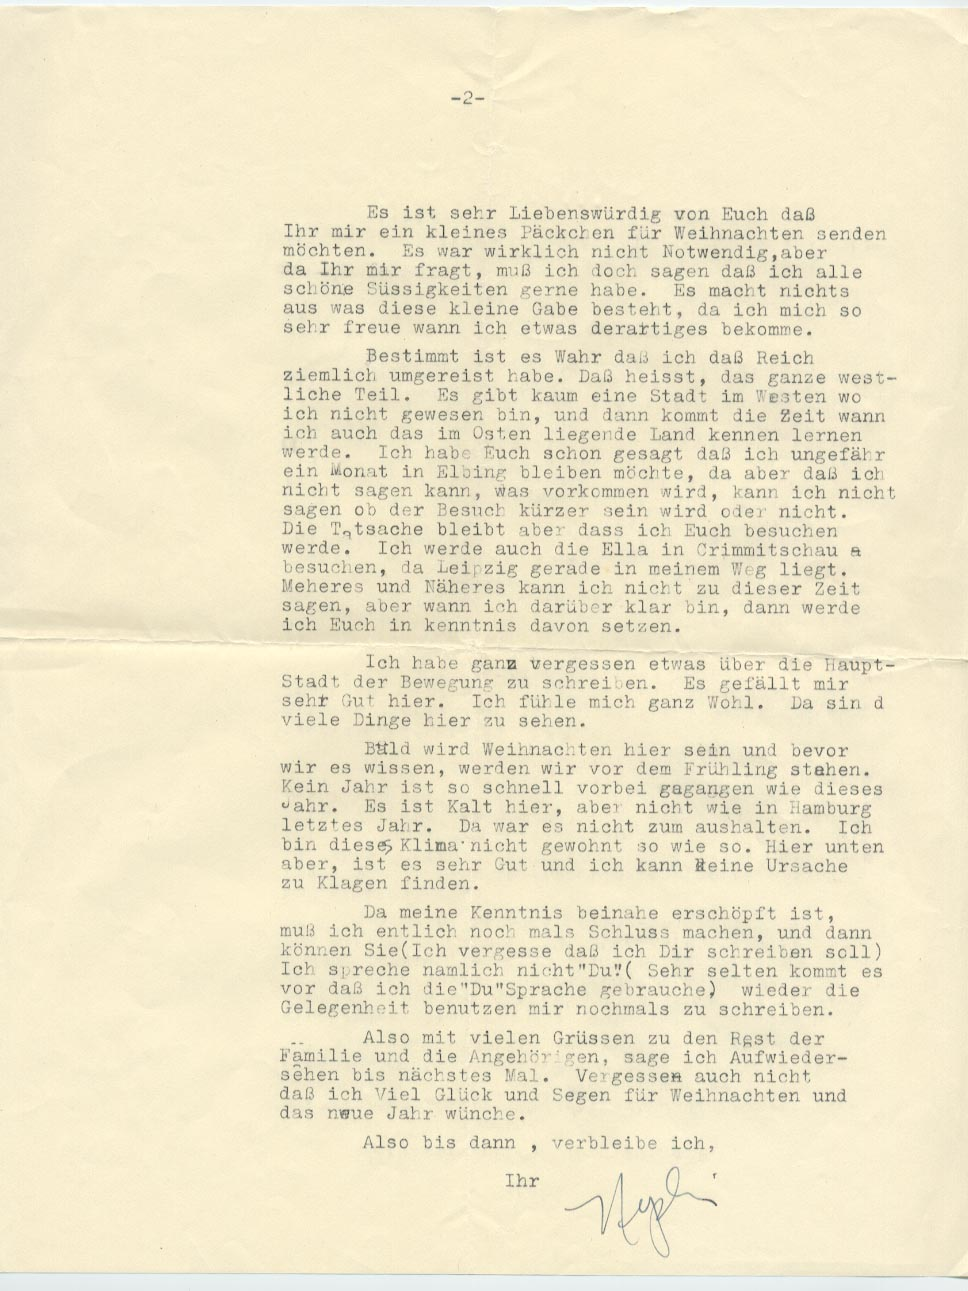 8 December 1935, p. 2